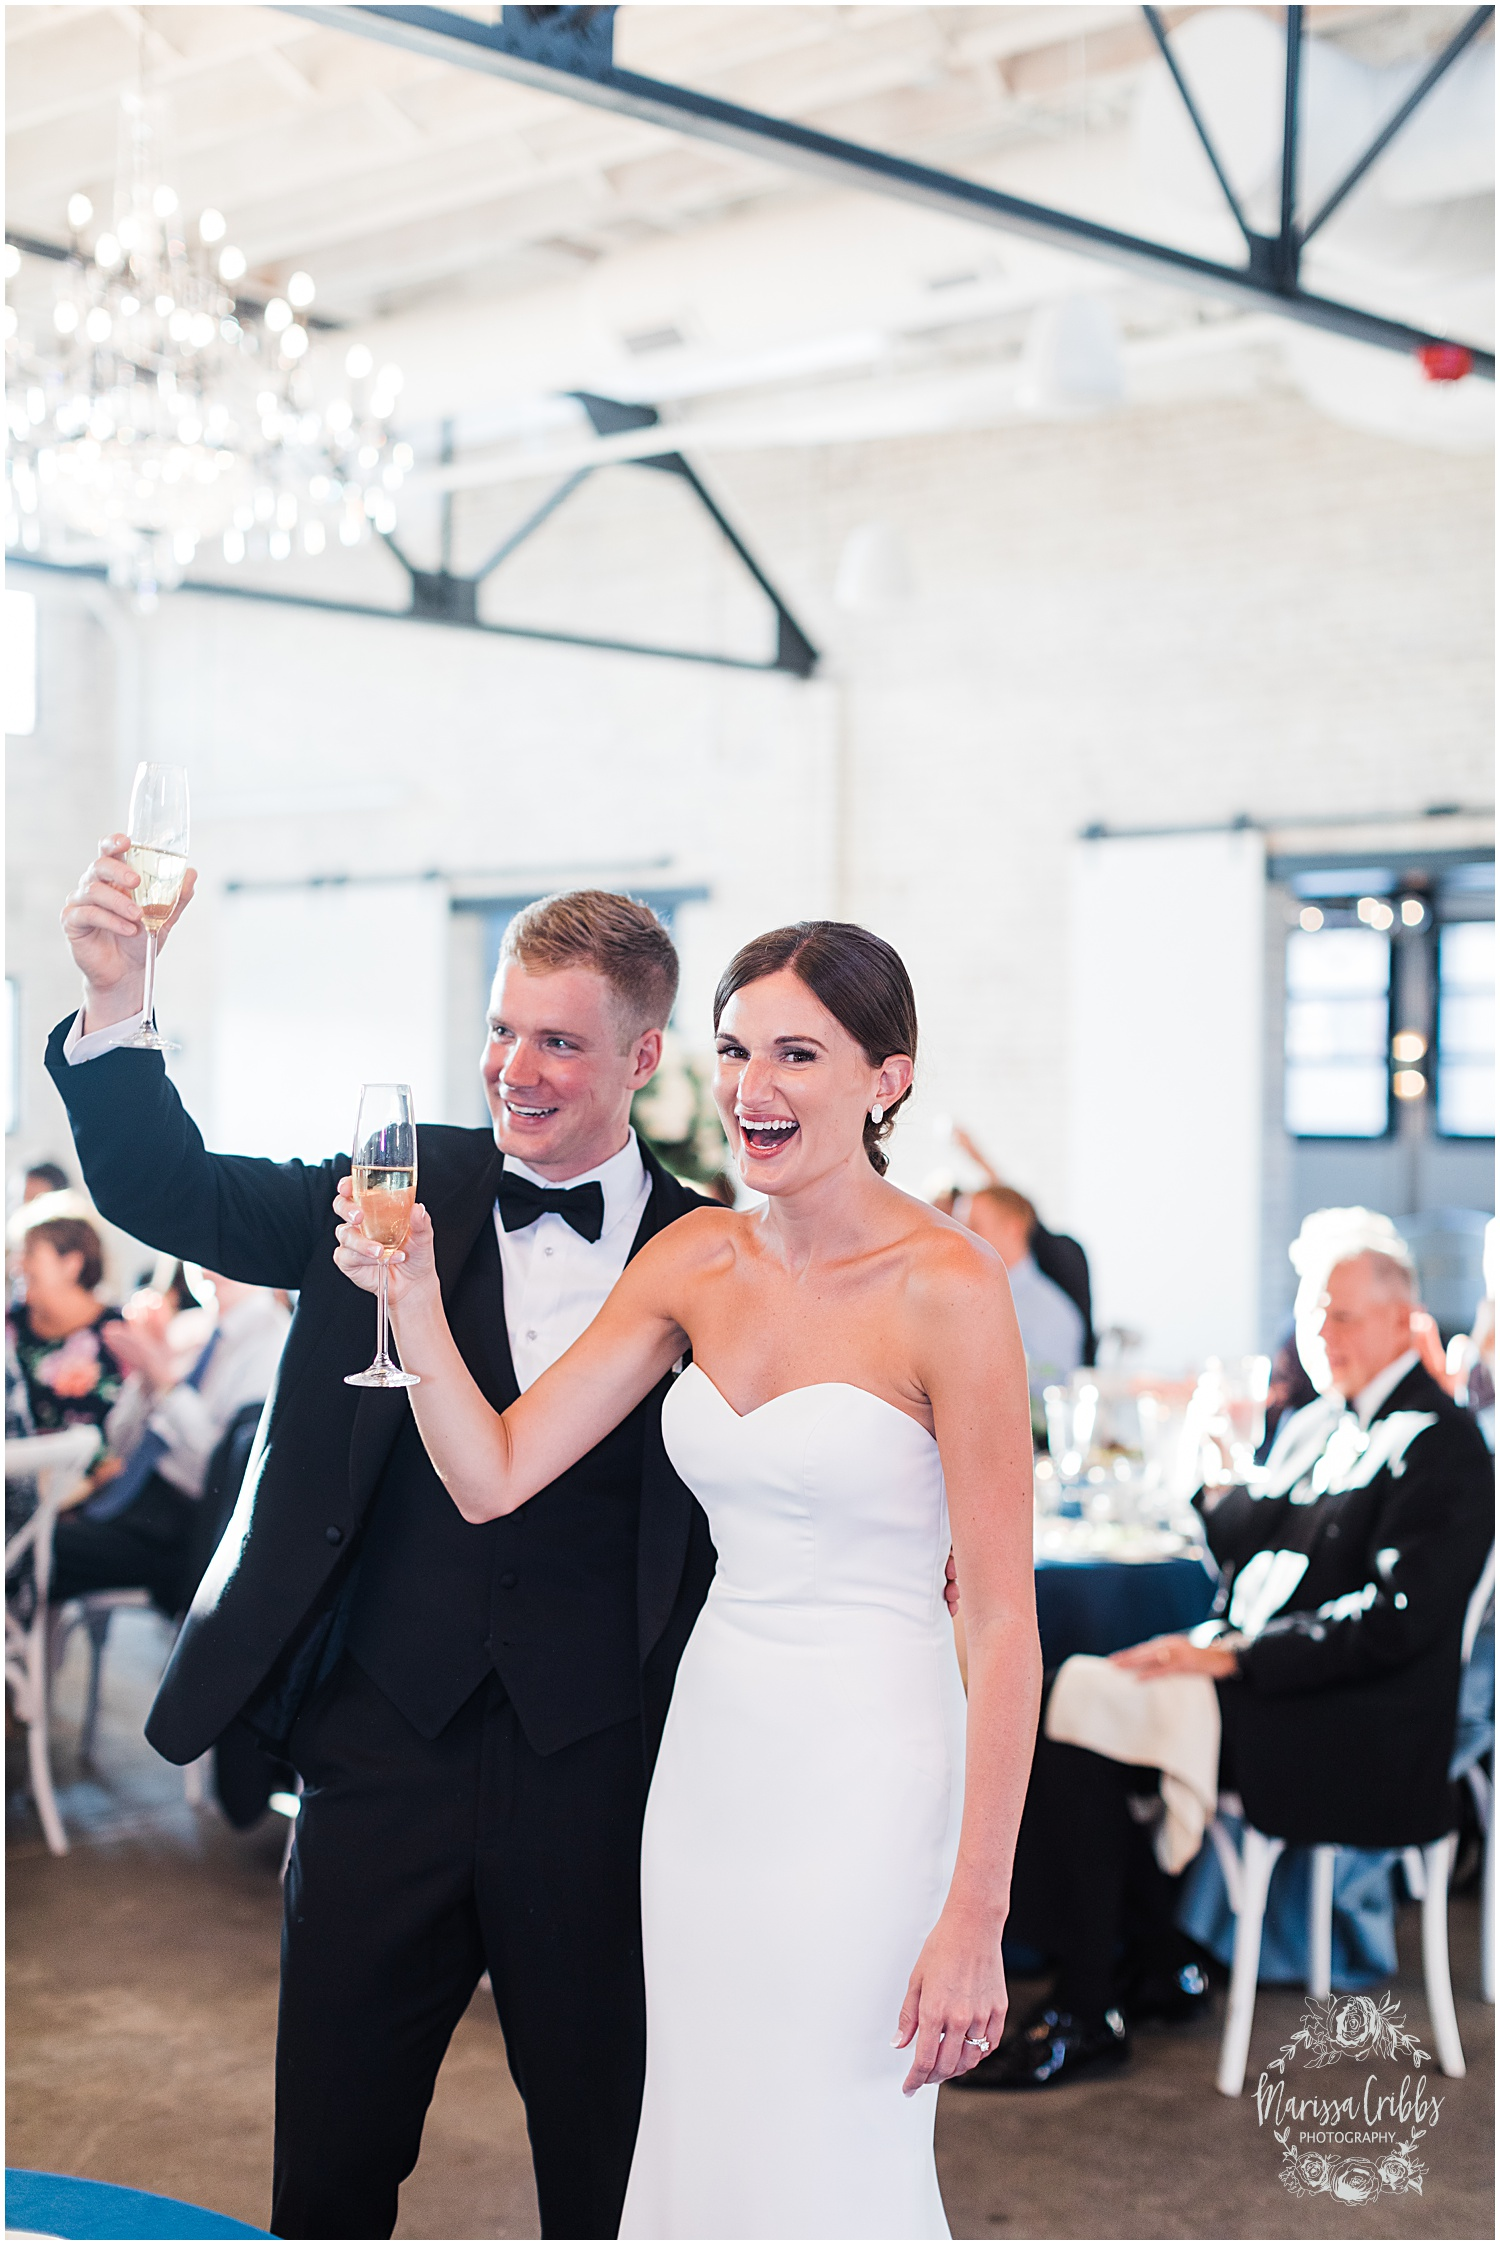 JOANNE & GEORGE MARRIED BLOG | MARISSA CRIBBS PHOTOGRAPHY | THE ABBOTT | KANSAS CITY WEDDING PHOTOS_9159.jpg